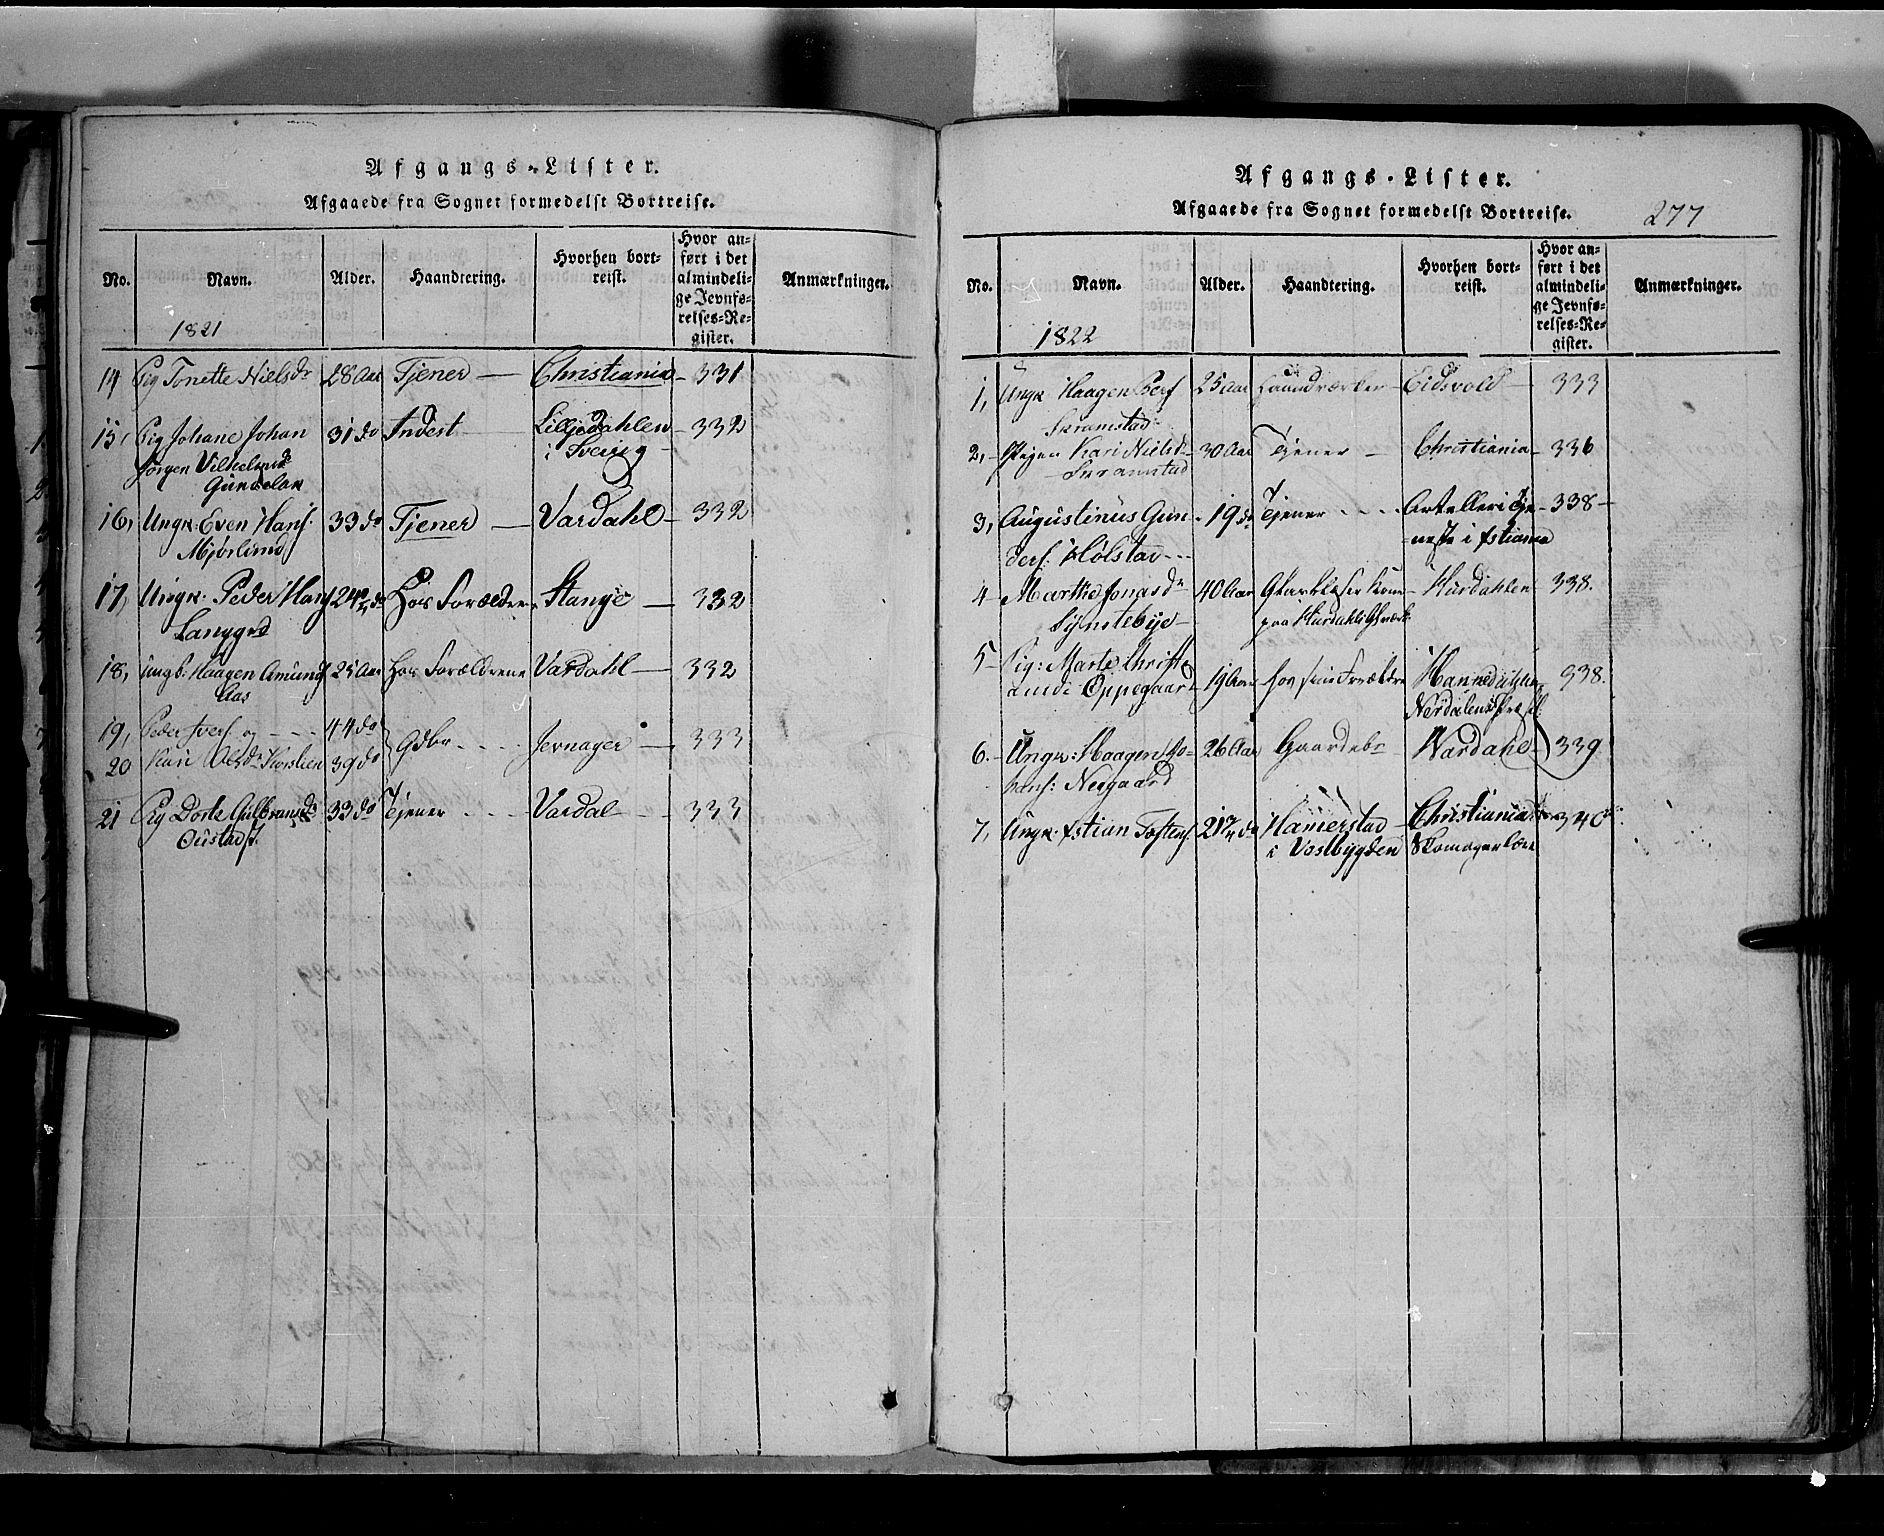 SAH, Toten prestekontor, Klokkerbok nr. 2, 1820-1827, s. 277